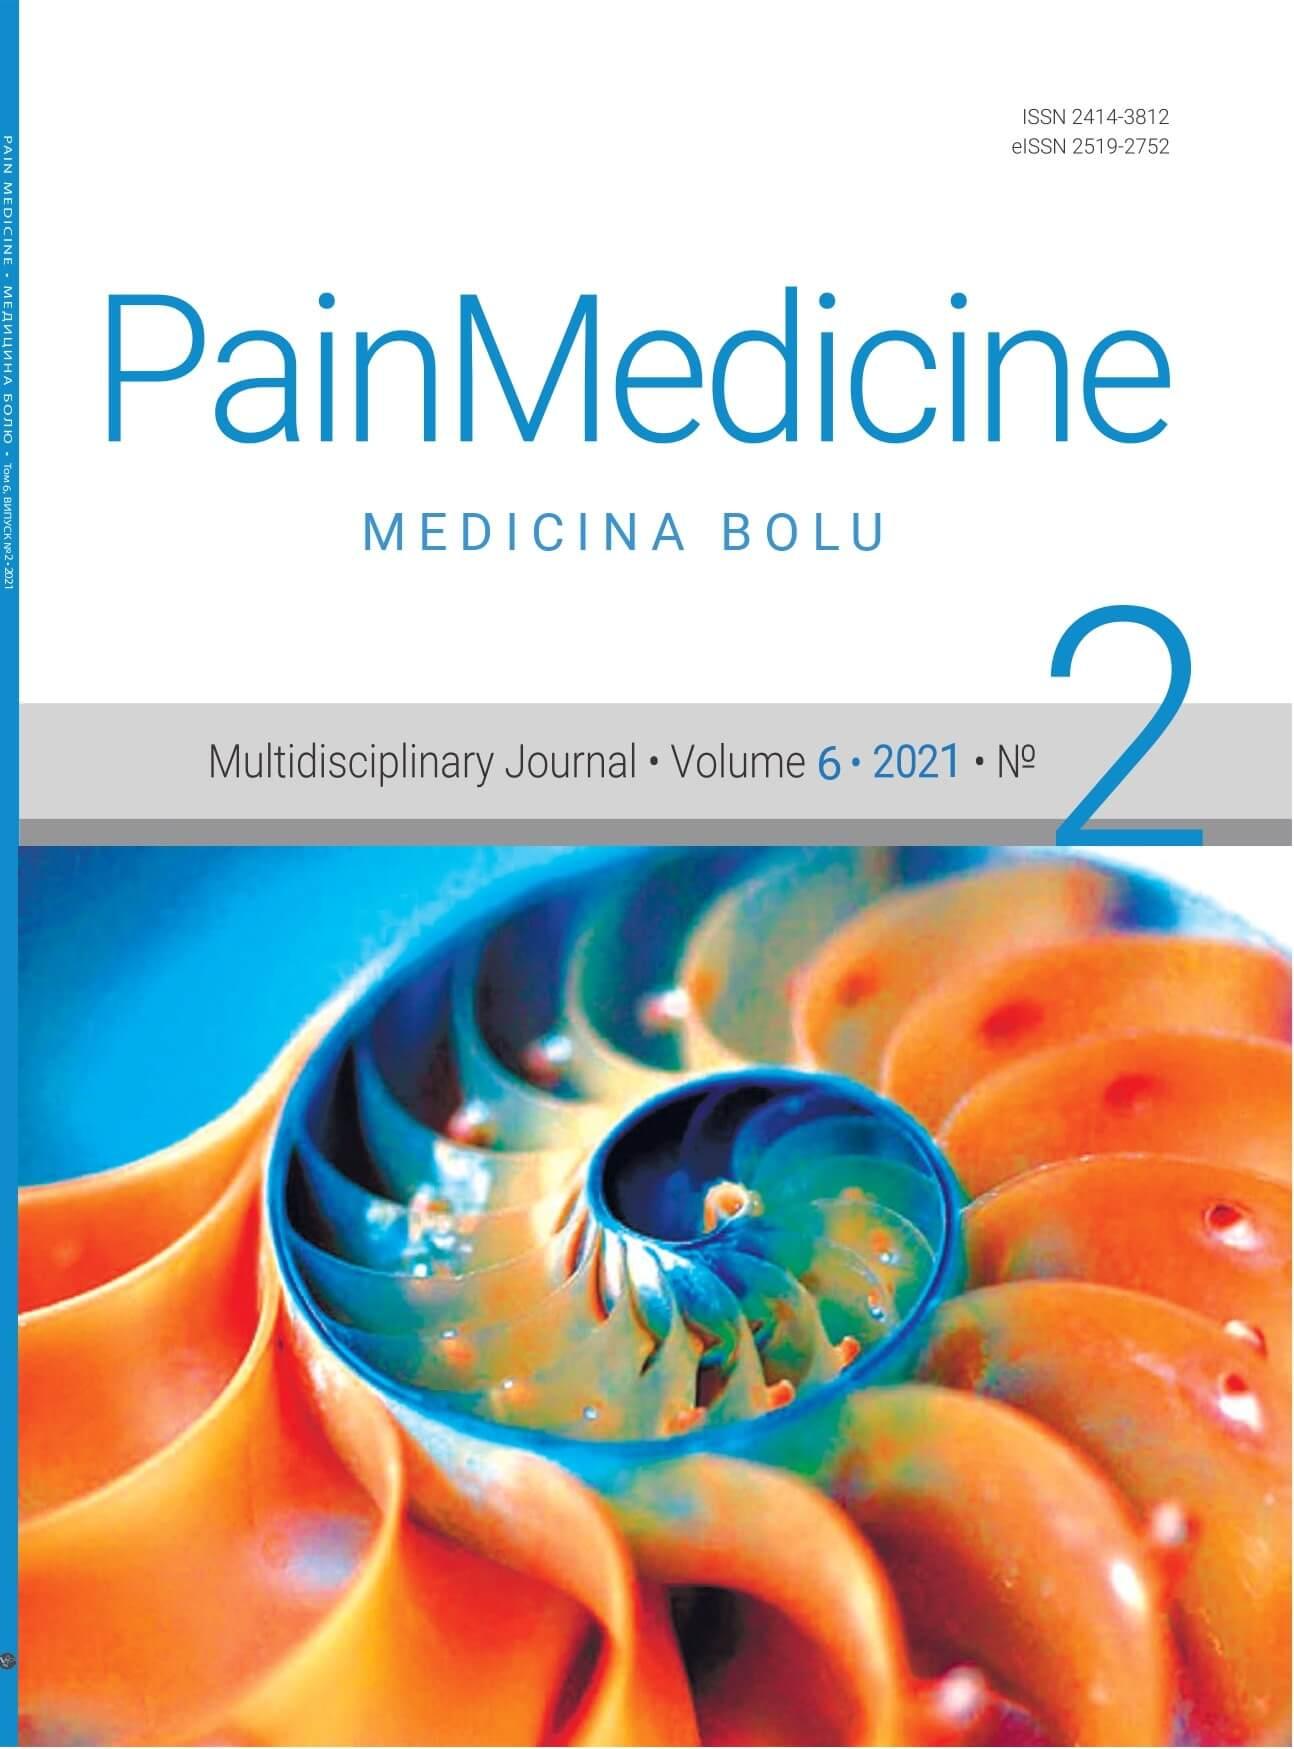 Pain Medicine volume 6 #2